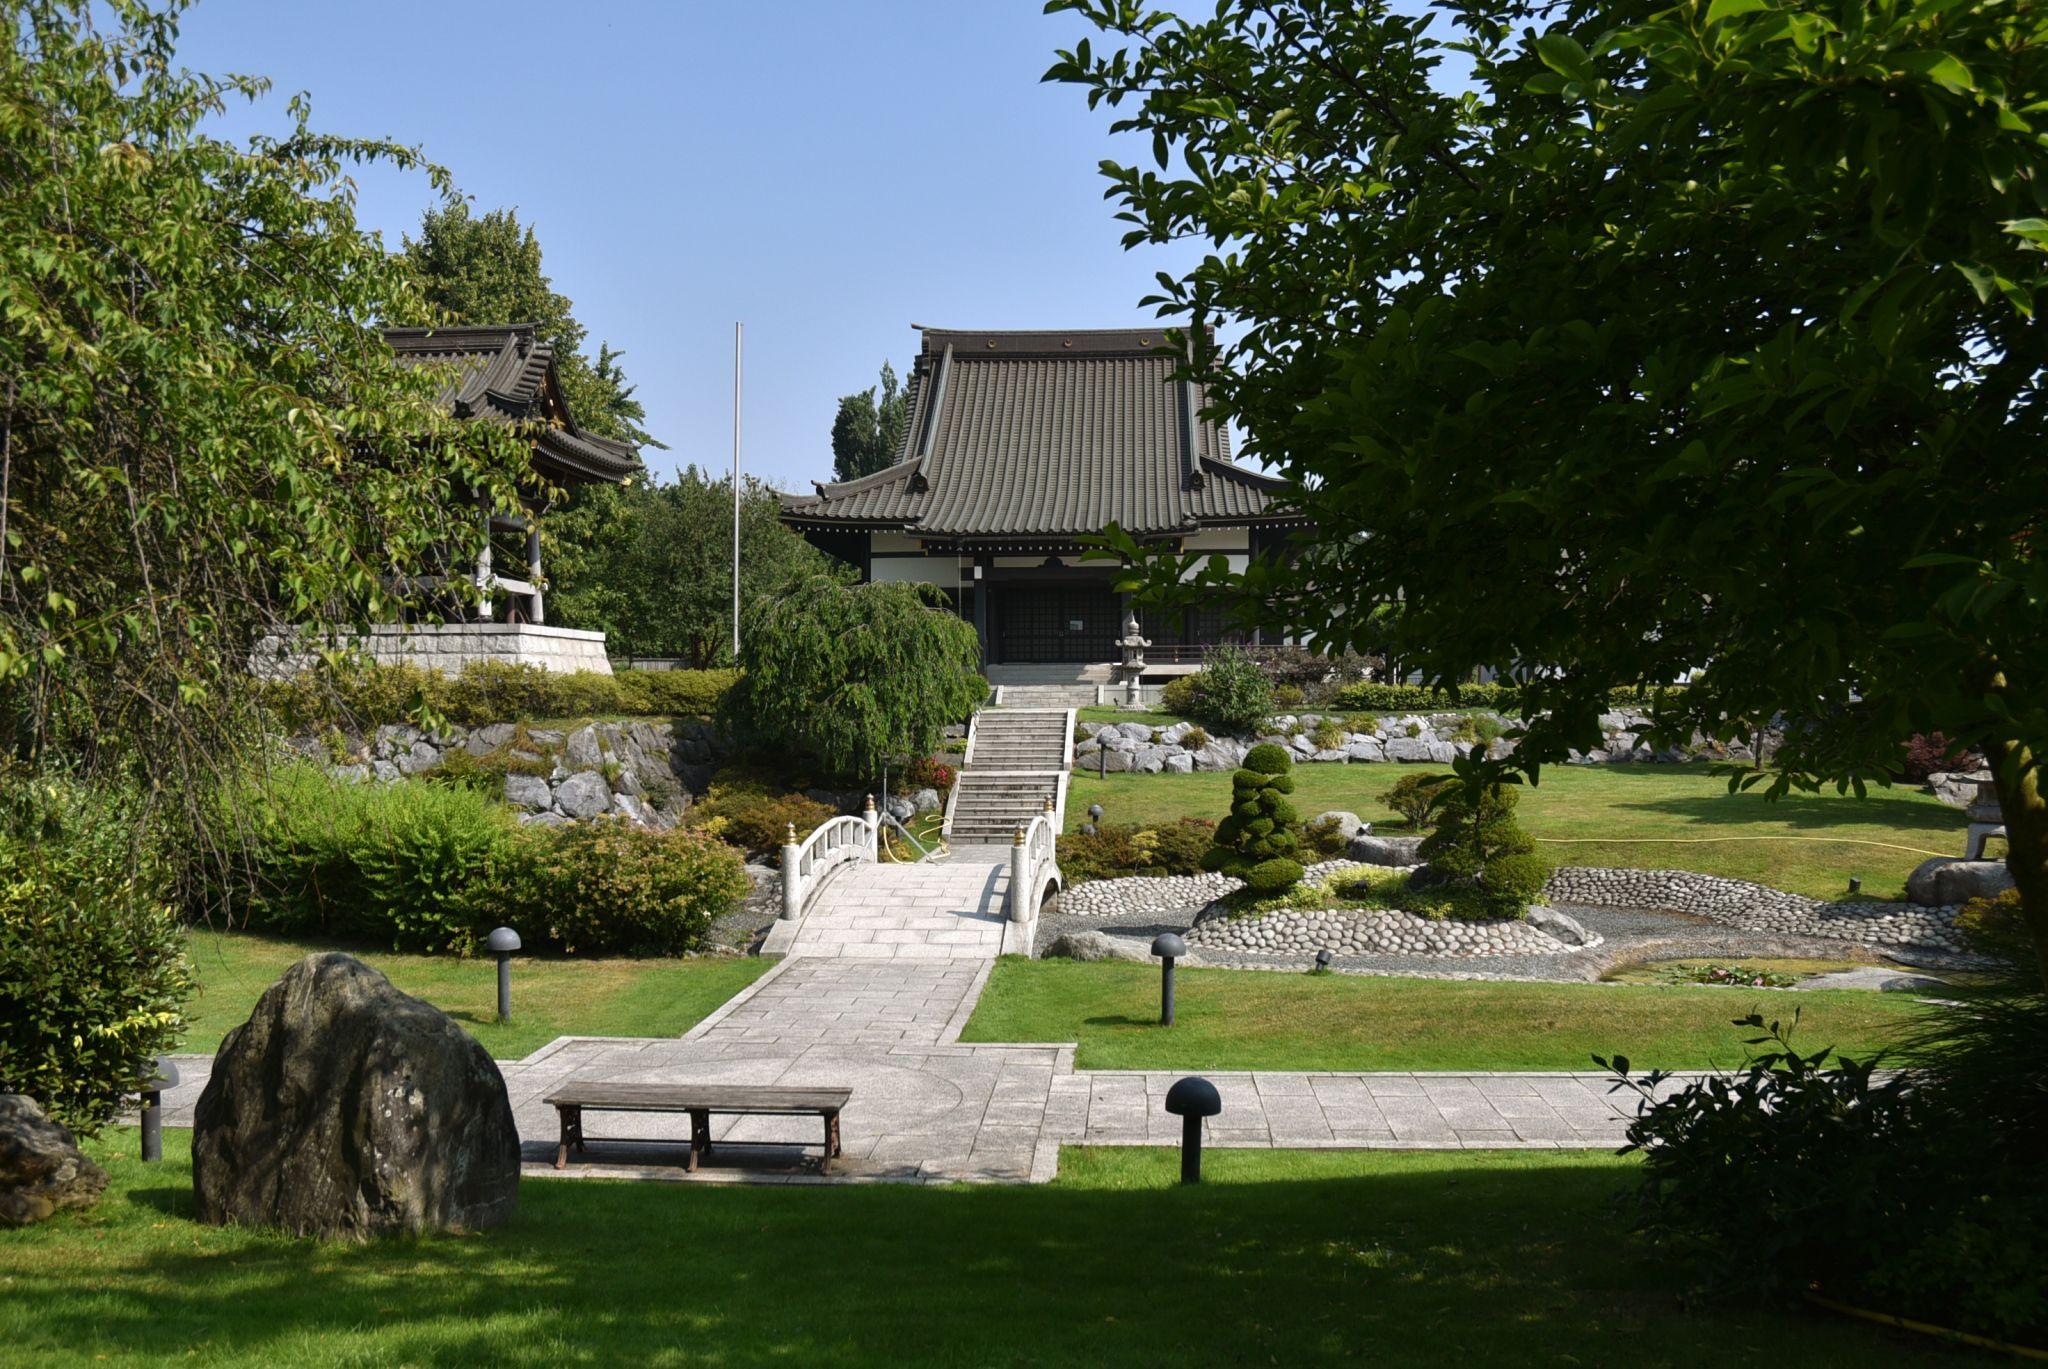 EKŌ-Haus der Japanischen Kultur e.V., Germany